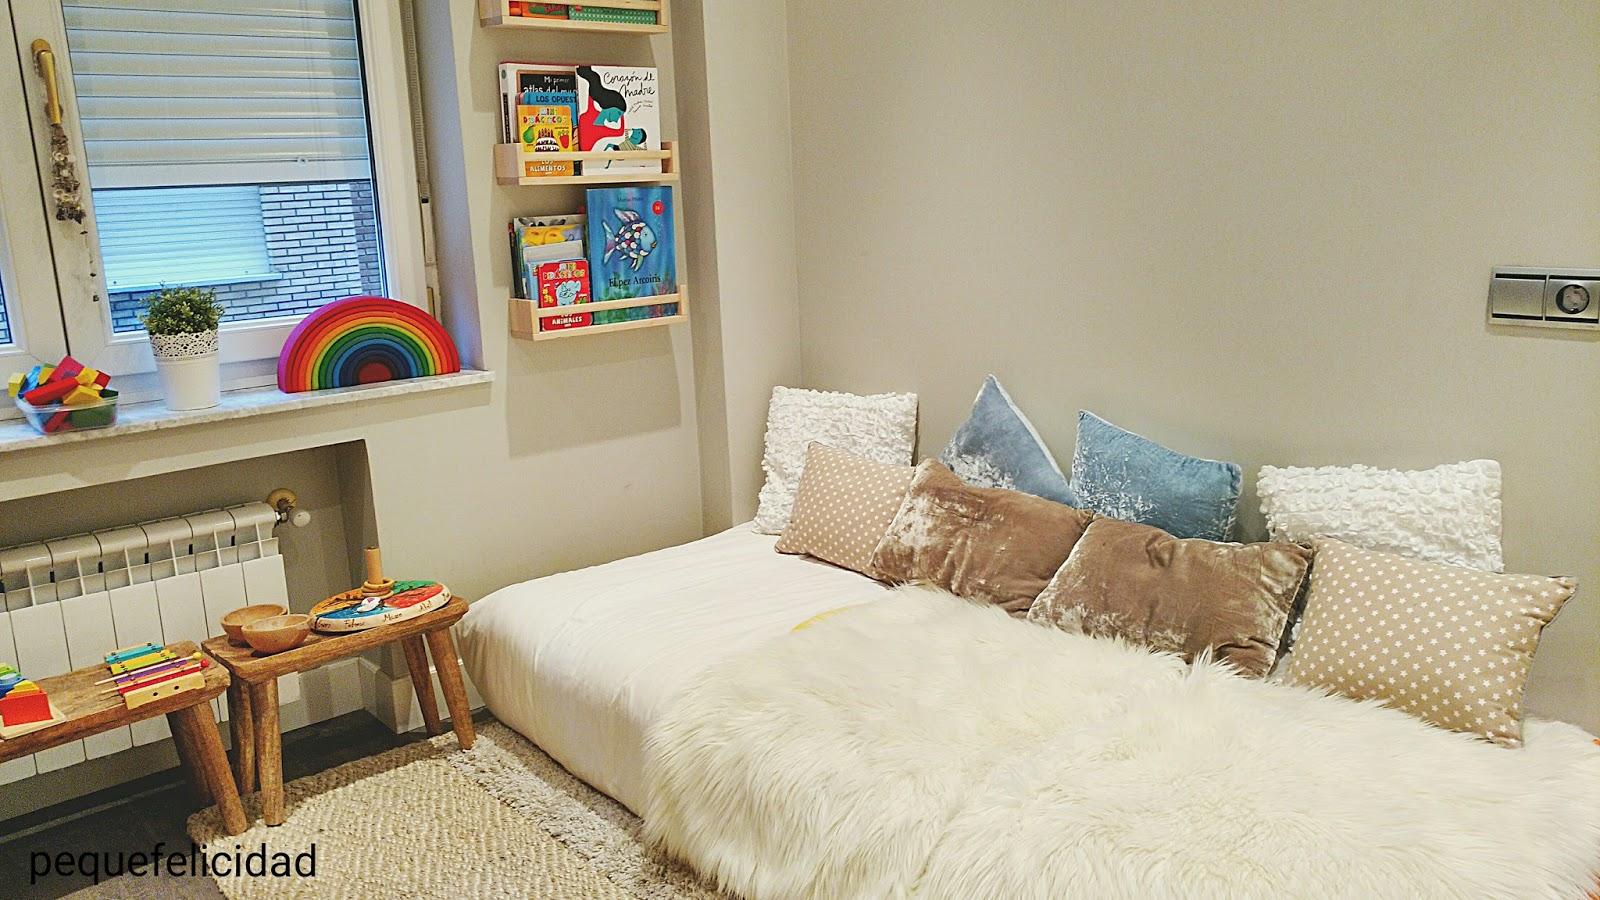 Pequefelicidad camas montessori for Cama familiar